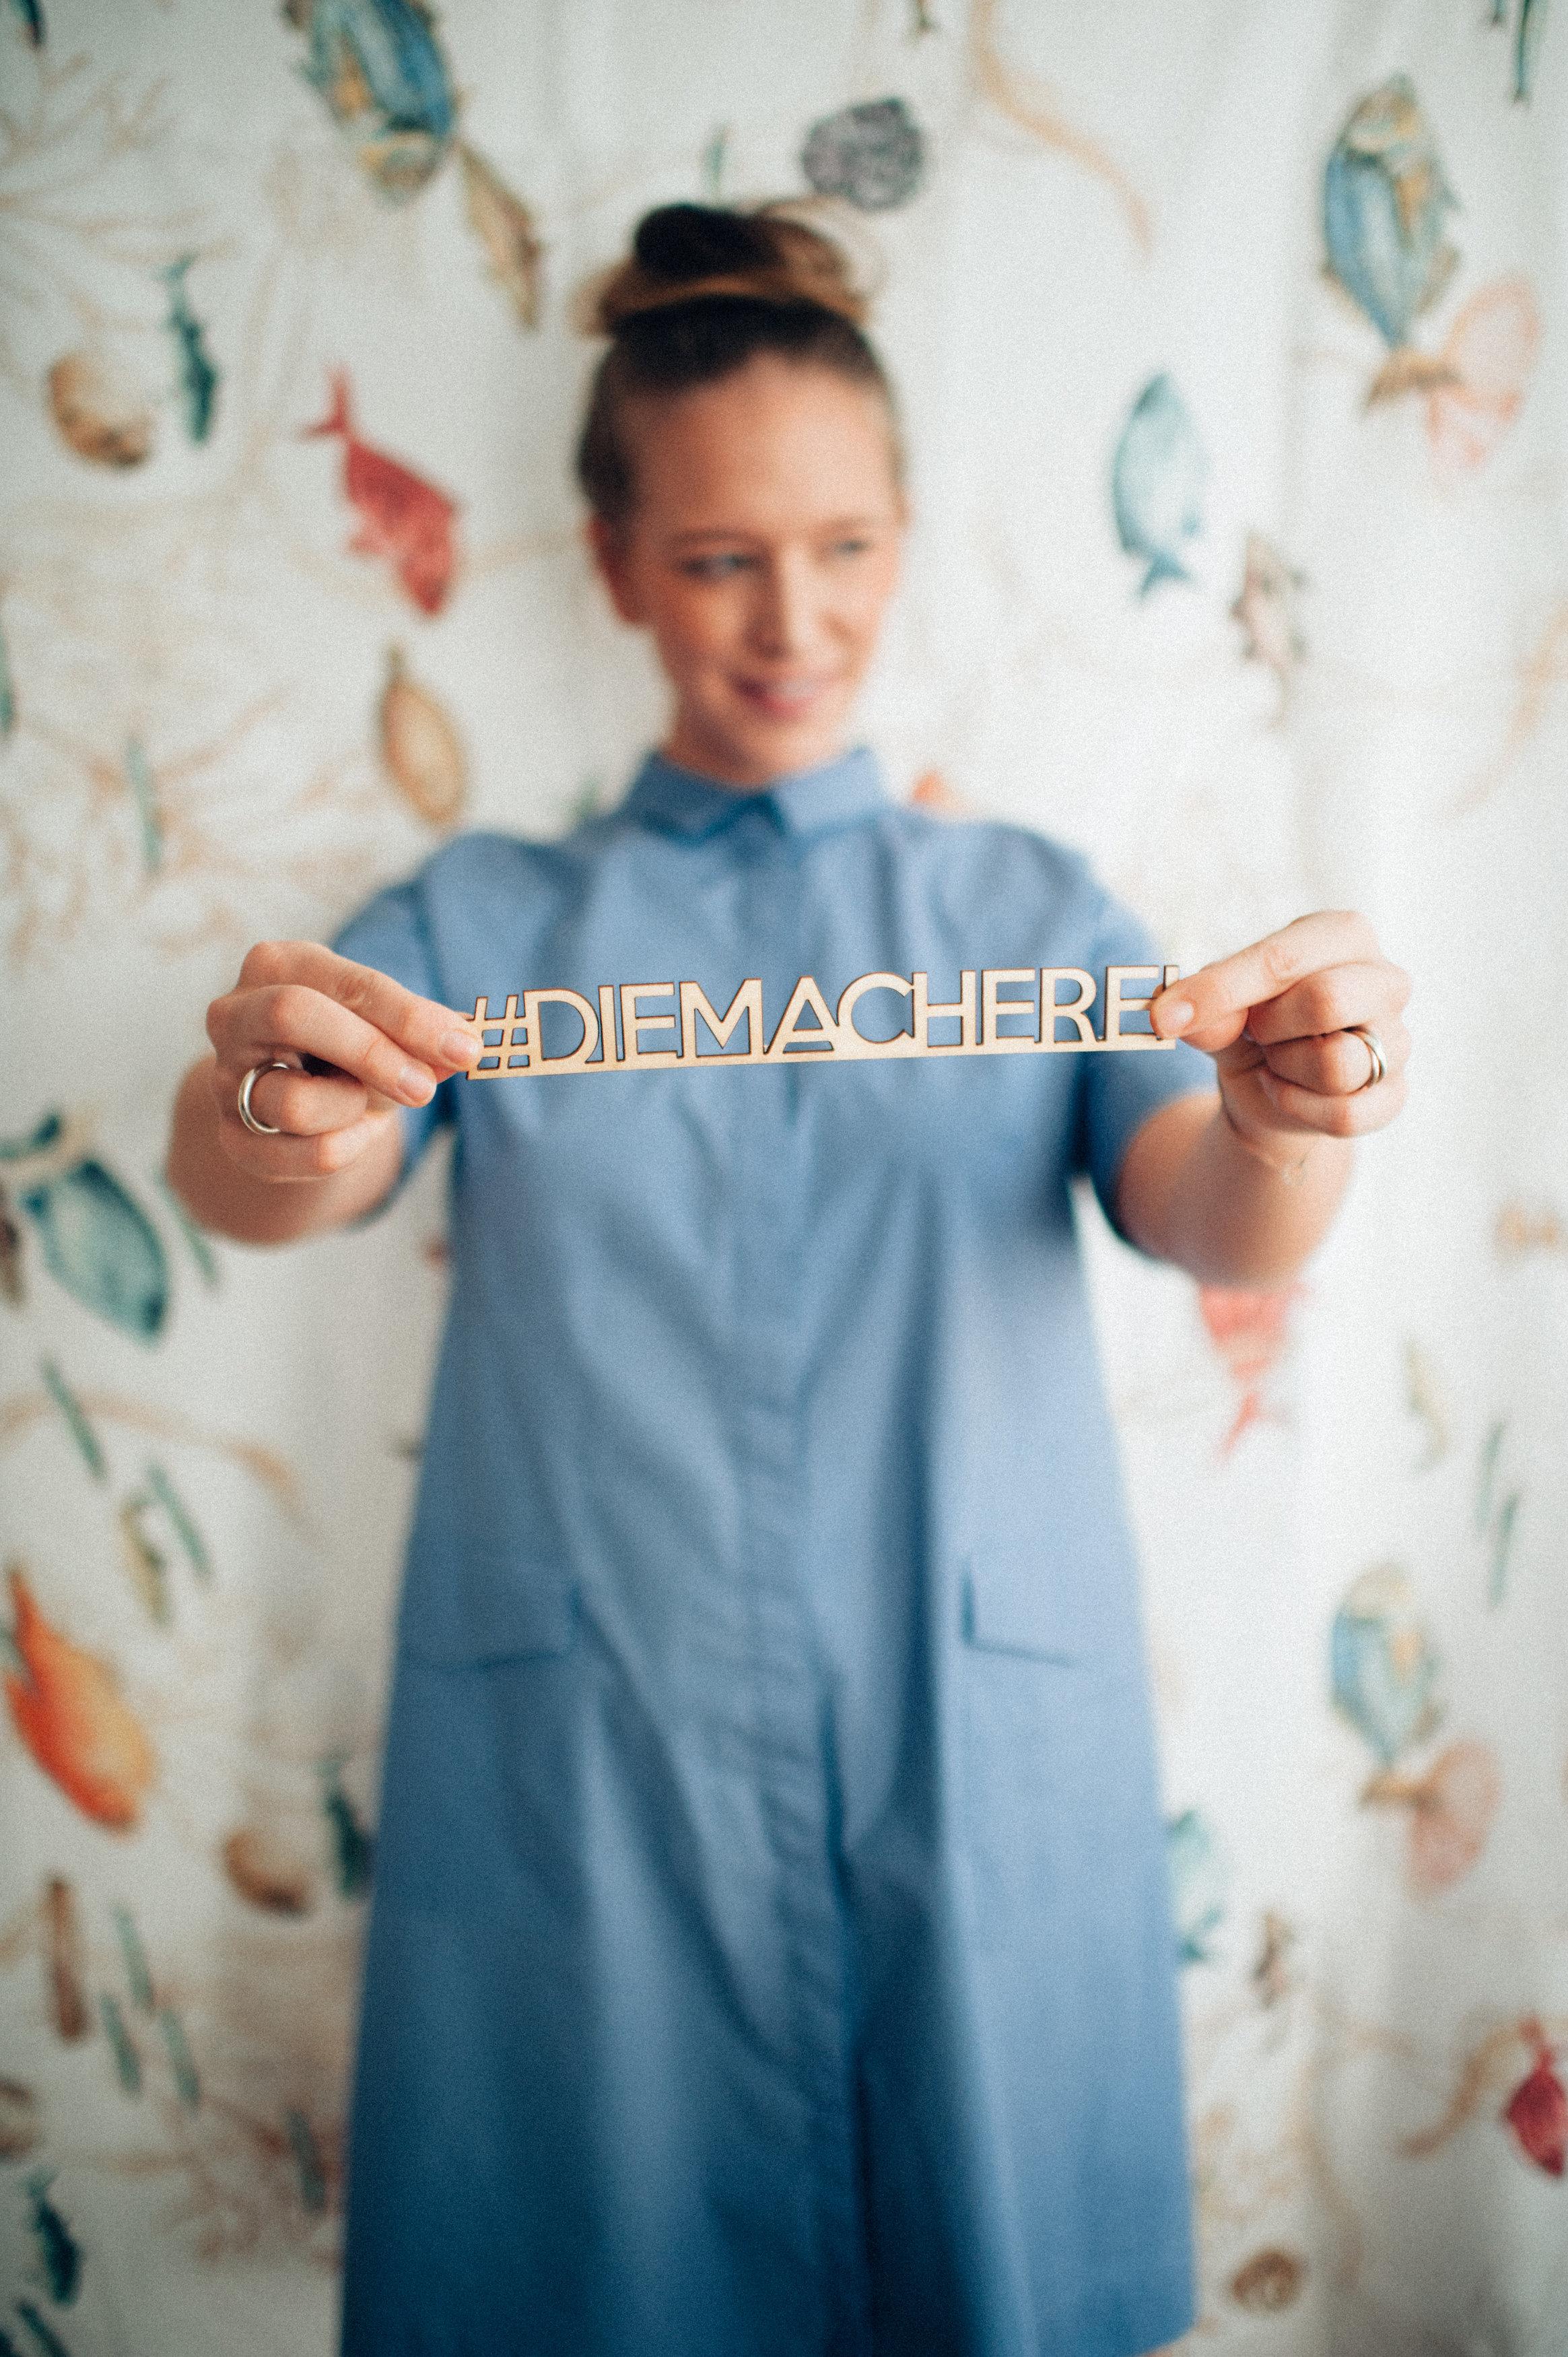 Podcast: Coffee Talk #3 - Vera - Girlboss, Dreamer, Doer, Mama. Die Macherei | you rock my life